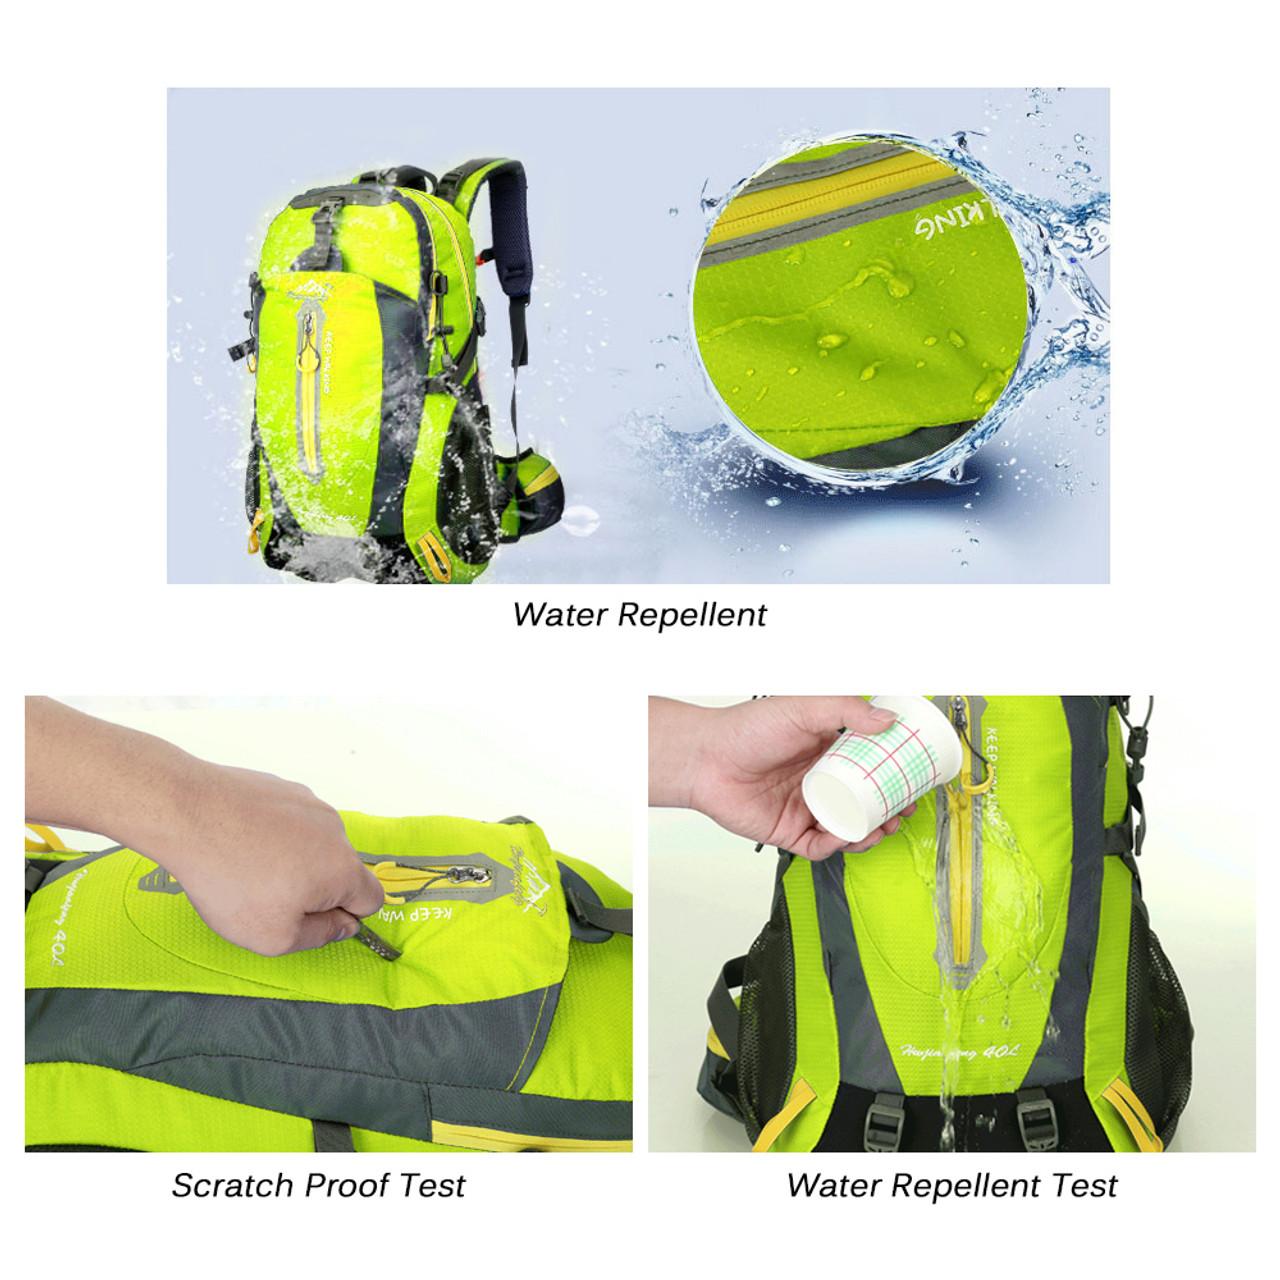 ... 40L Waterproof Climbing Bag Travel Backpack Bike Bicycle Bag Camping  Hike Laptop Daypack Rucksack Outdoor Men ... 07e16045eb